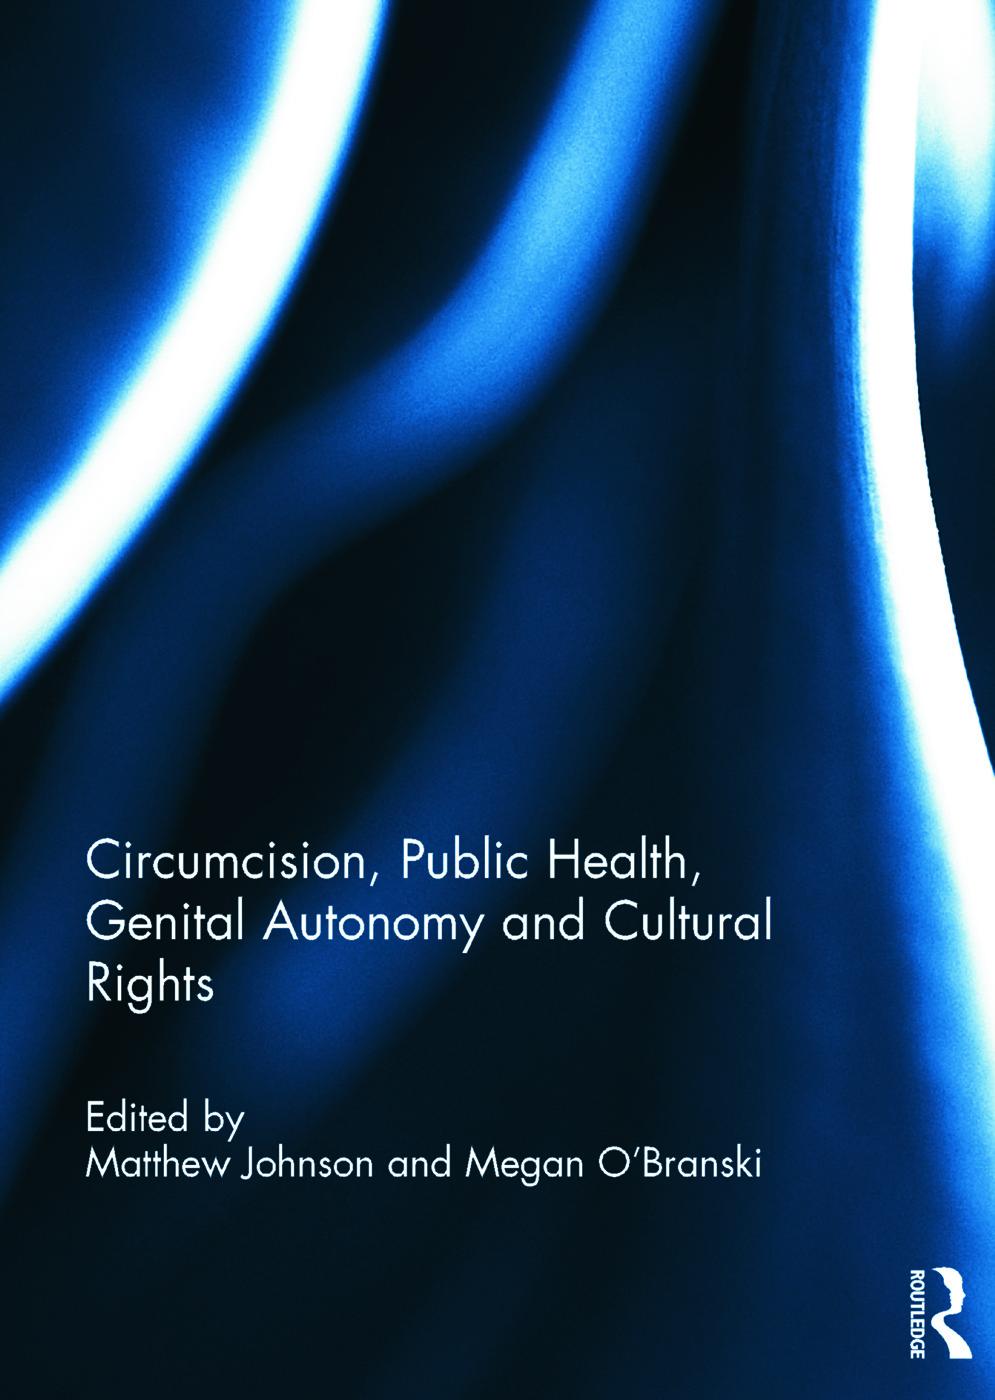 Circumcision, Public Health, Genital Autonomy and Cultural Rights: 1st Edition (Hardback) book cover